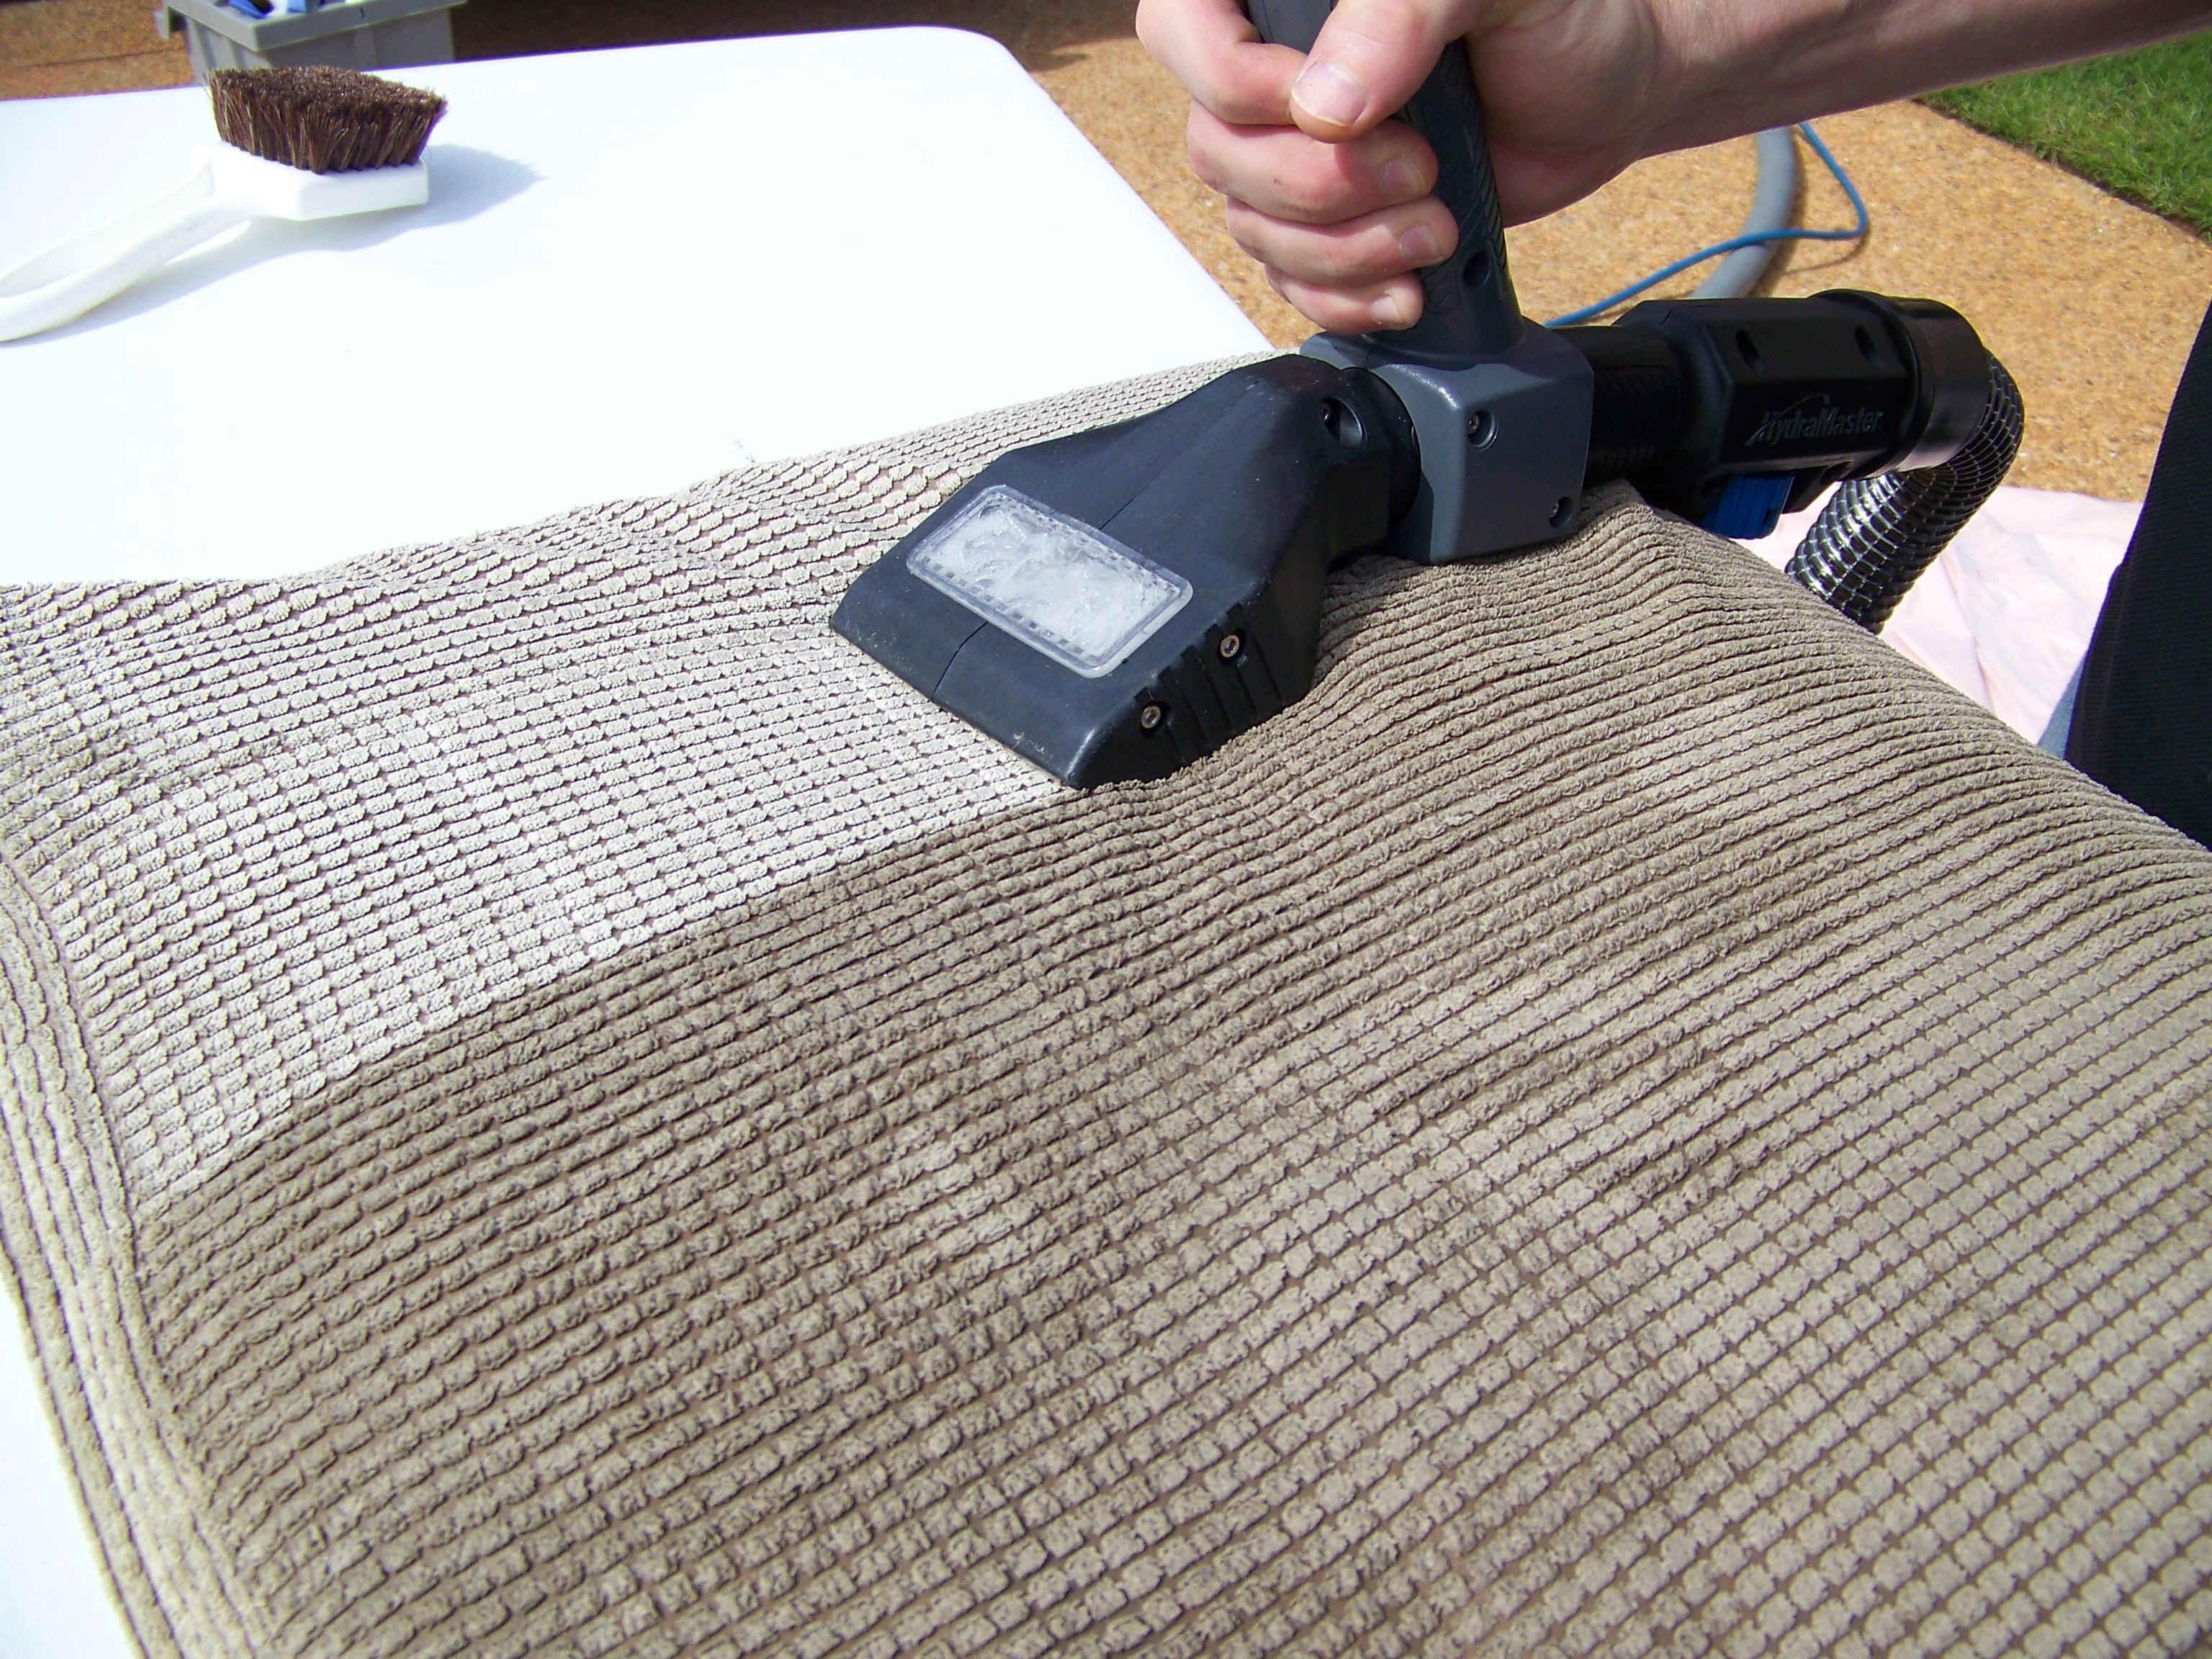 Carpet Cleaning Gravesend - Carpet Bright UK